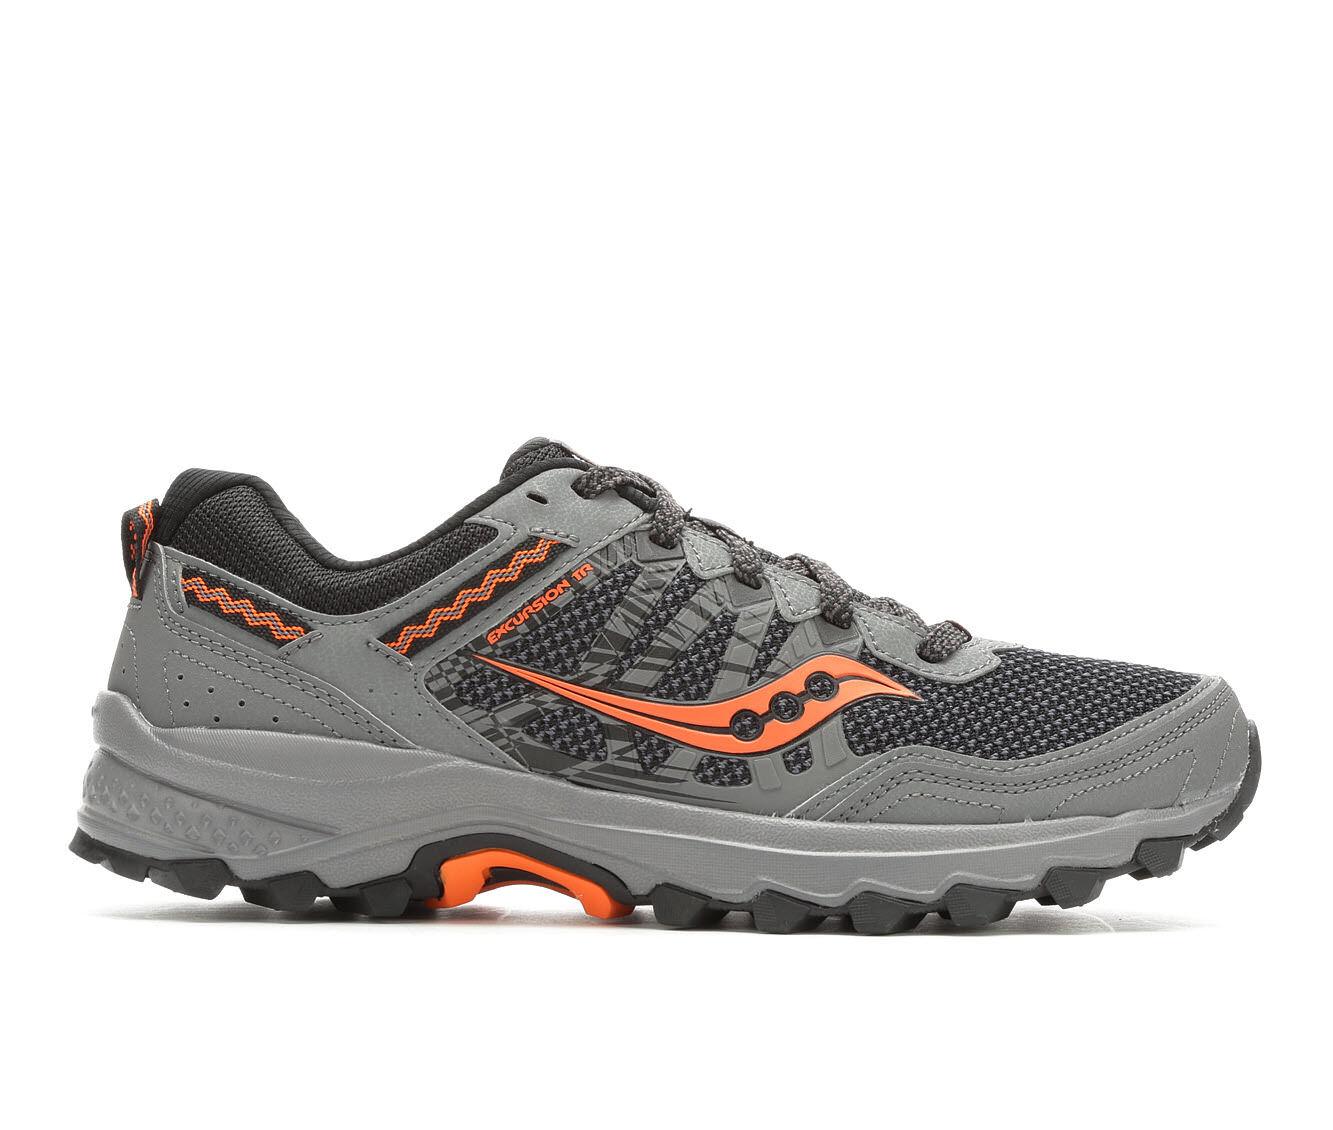 Men's Saucony Excursion TR12 Trail Running Shoes Grey/Orange